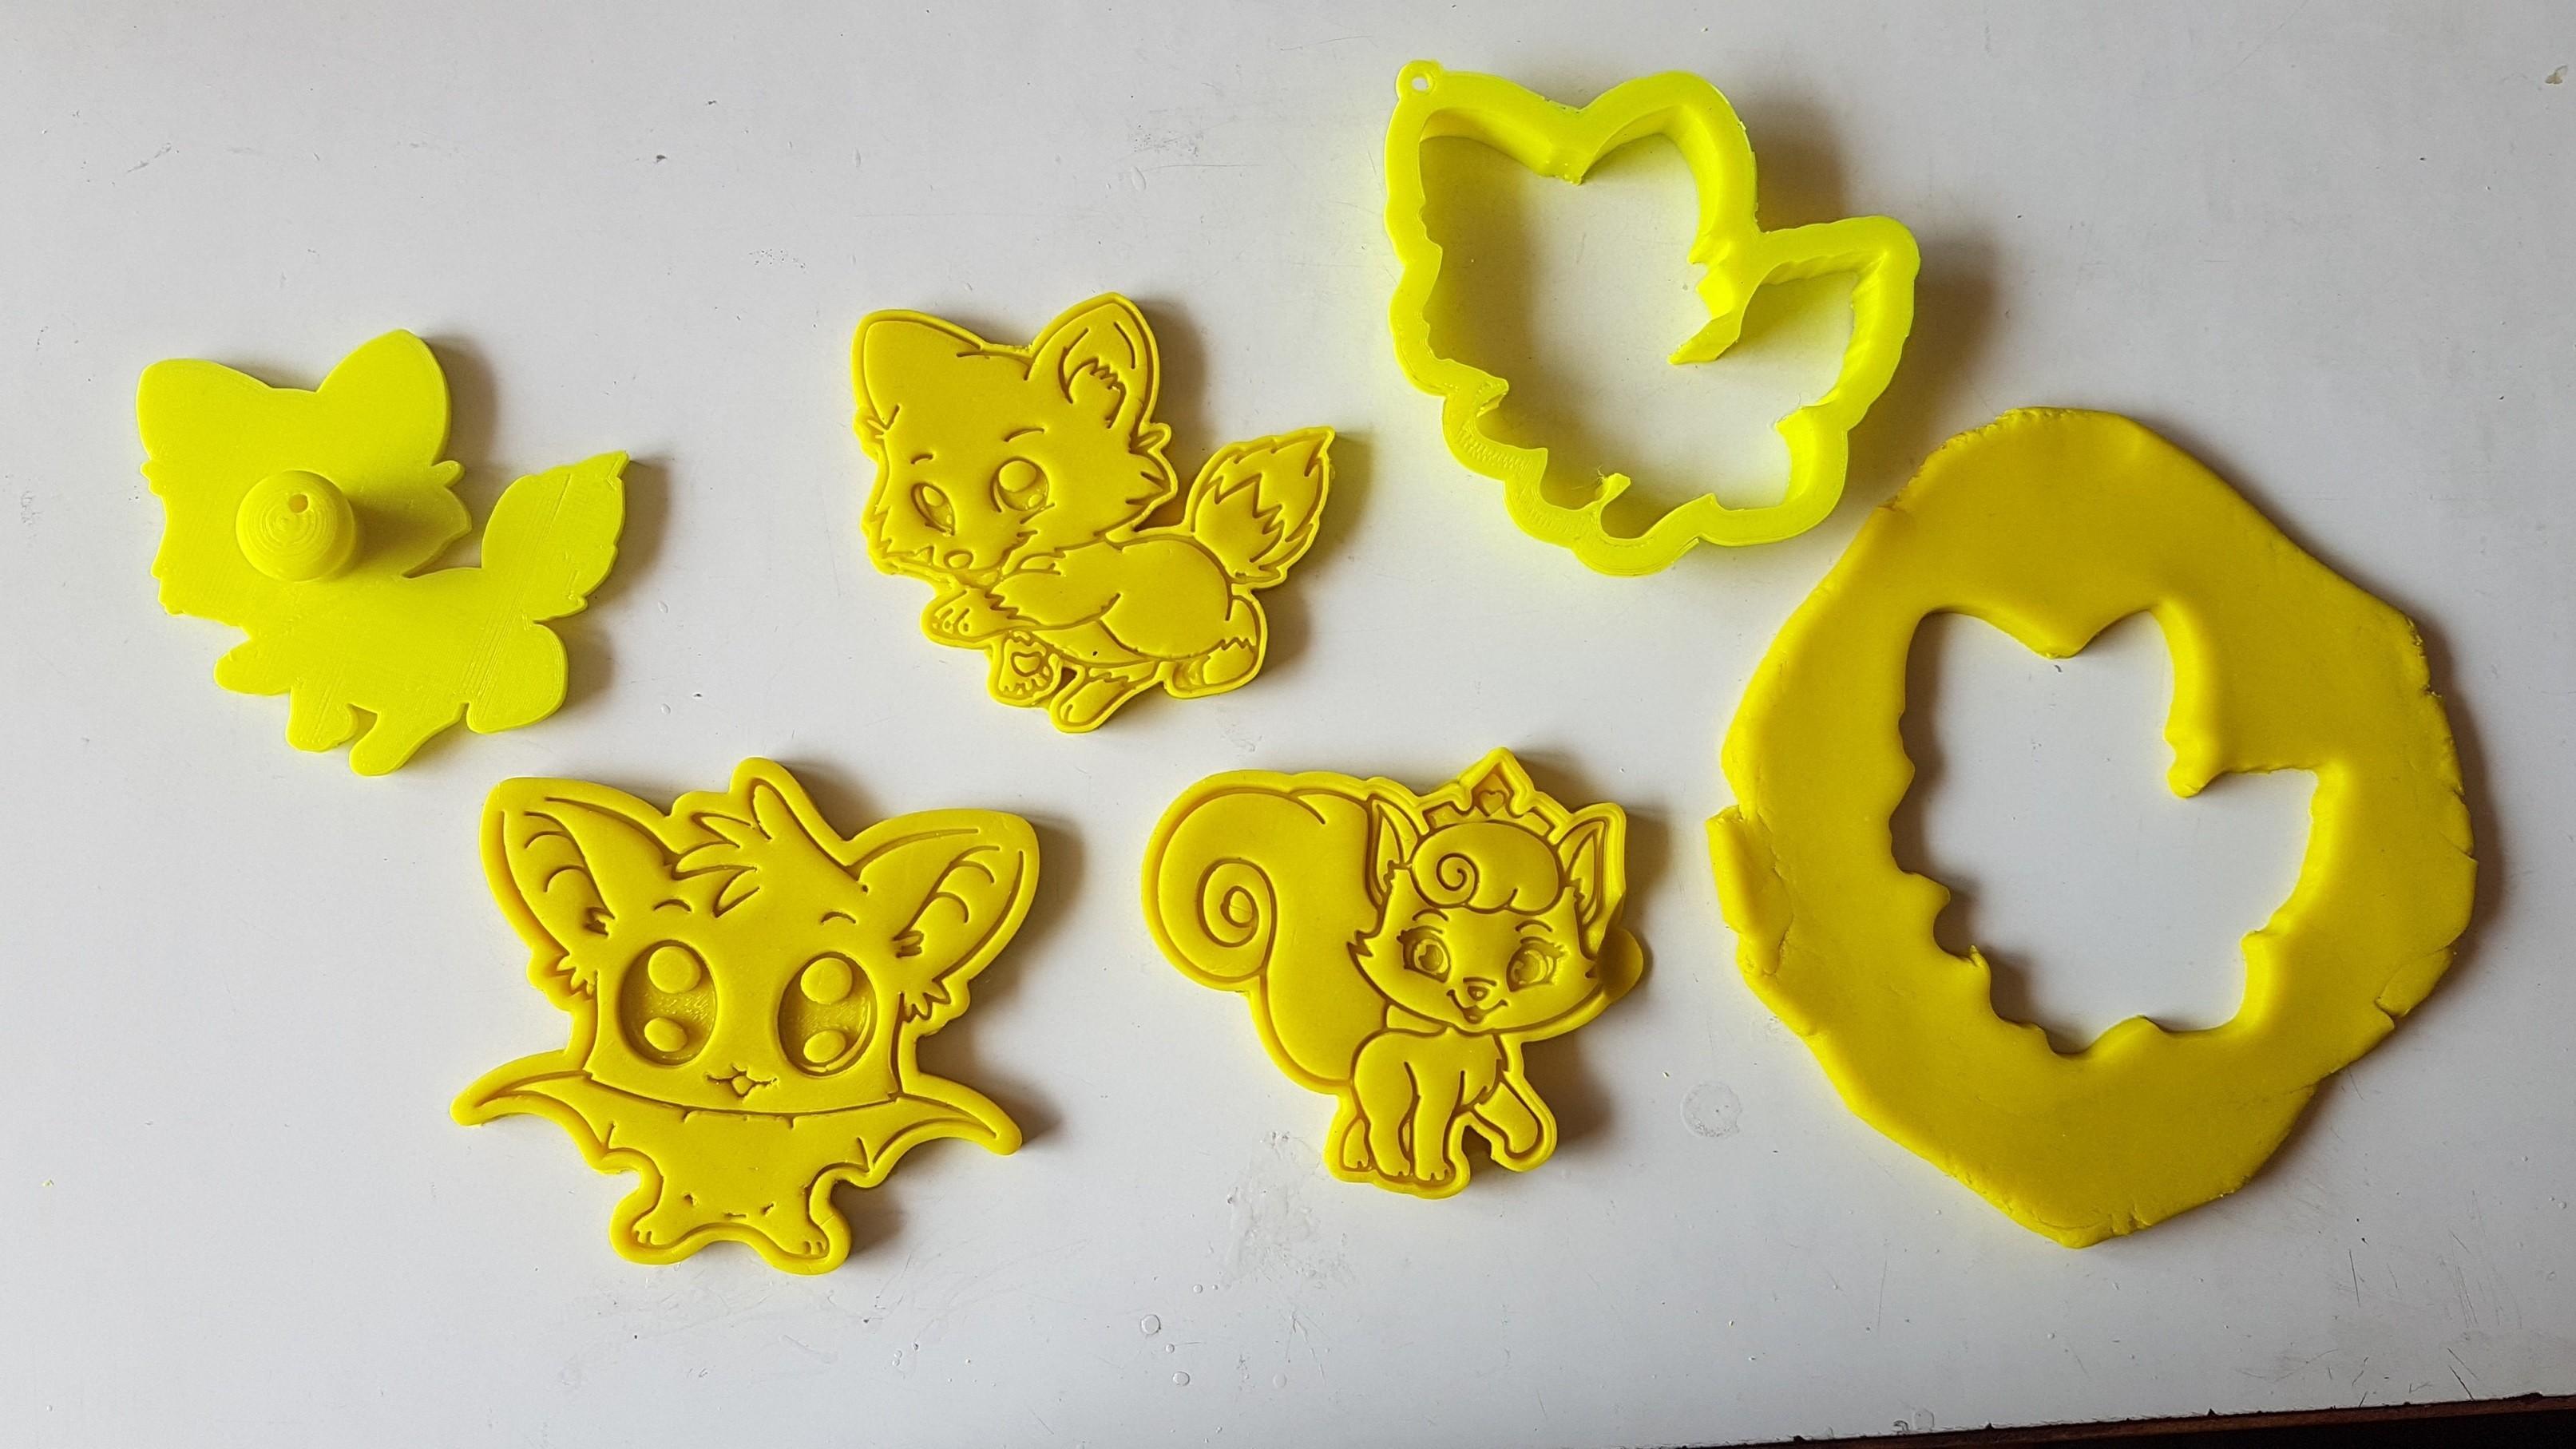 20180828_135821.jpg Download STL file Cute Fox Cookie Cutter • 3D printer template, 3dfactory